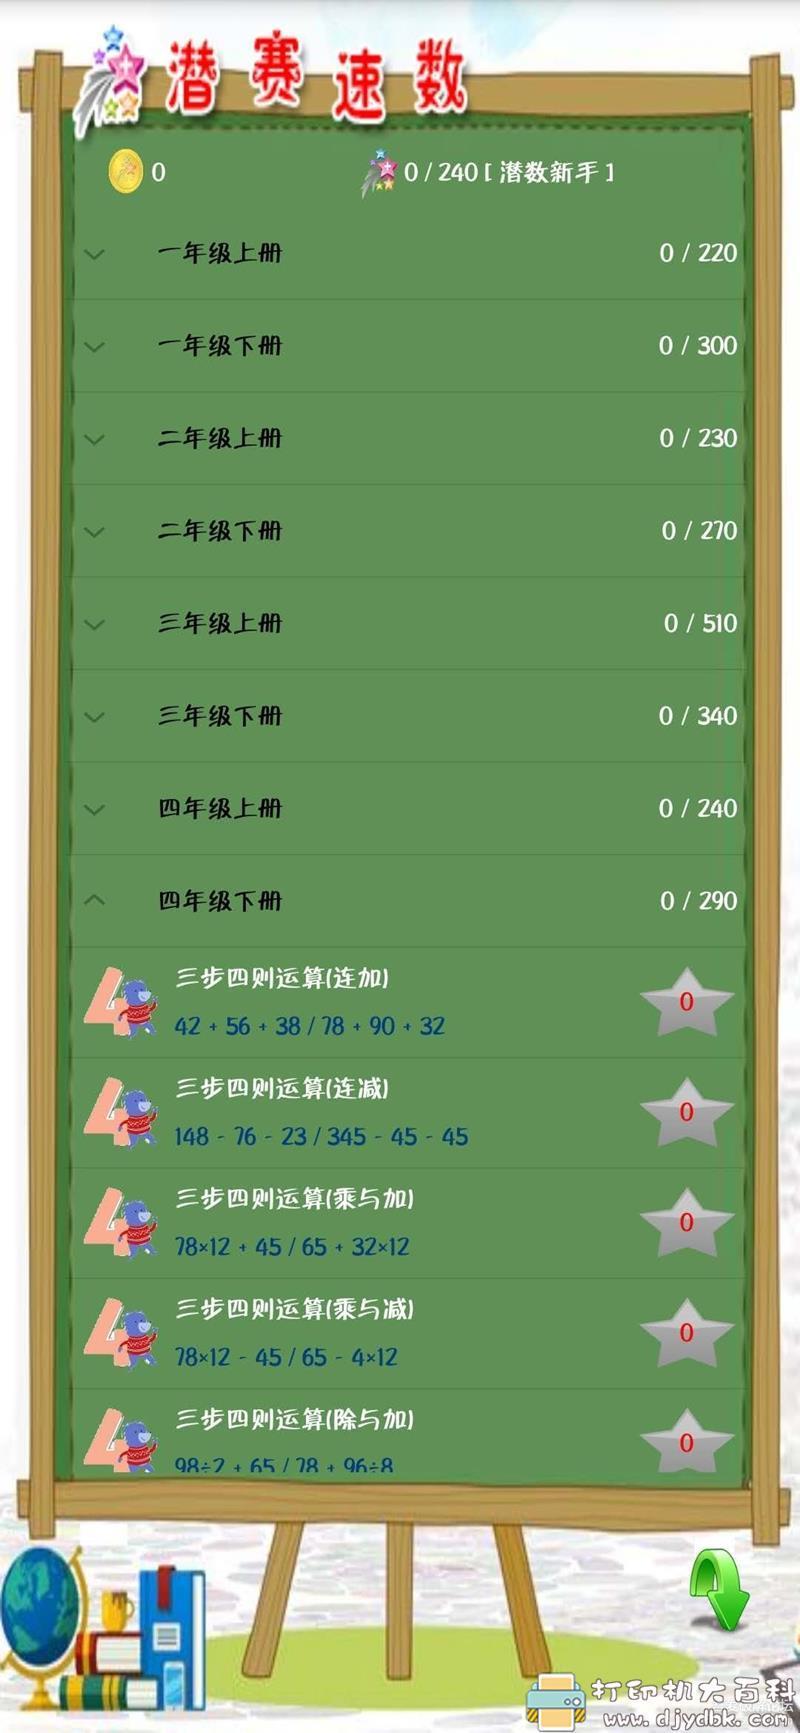 [Android]提升孩子计算能力 【潜赛速数】小学生计算训练APP 配图 No.2